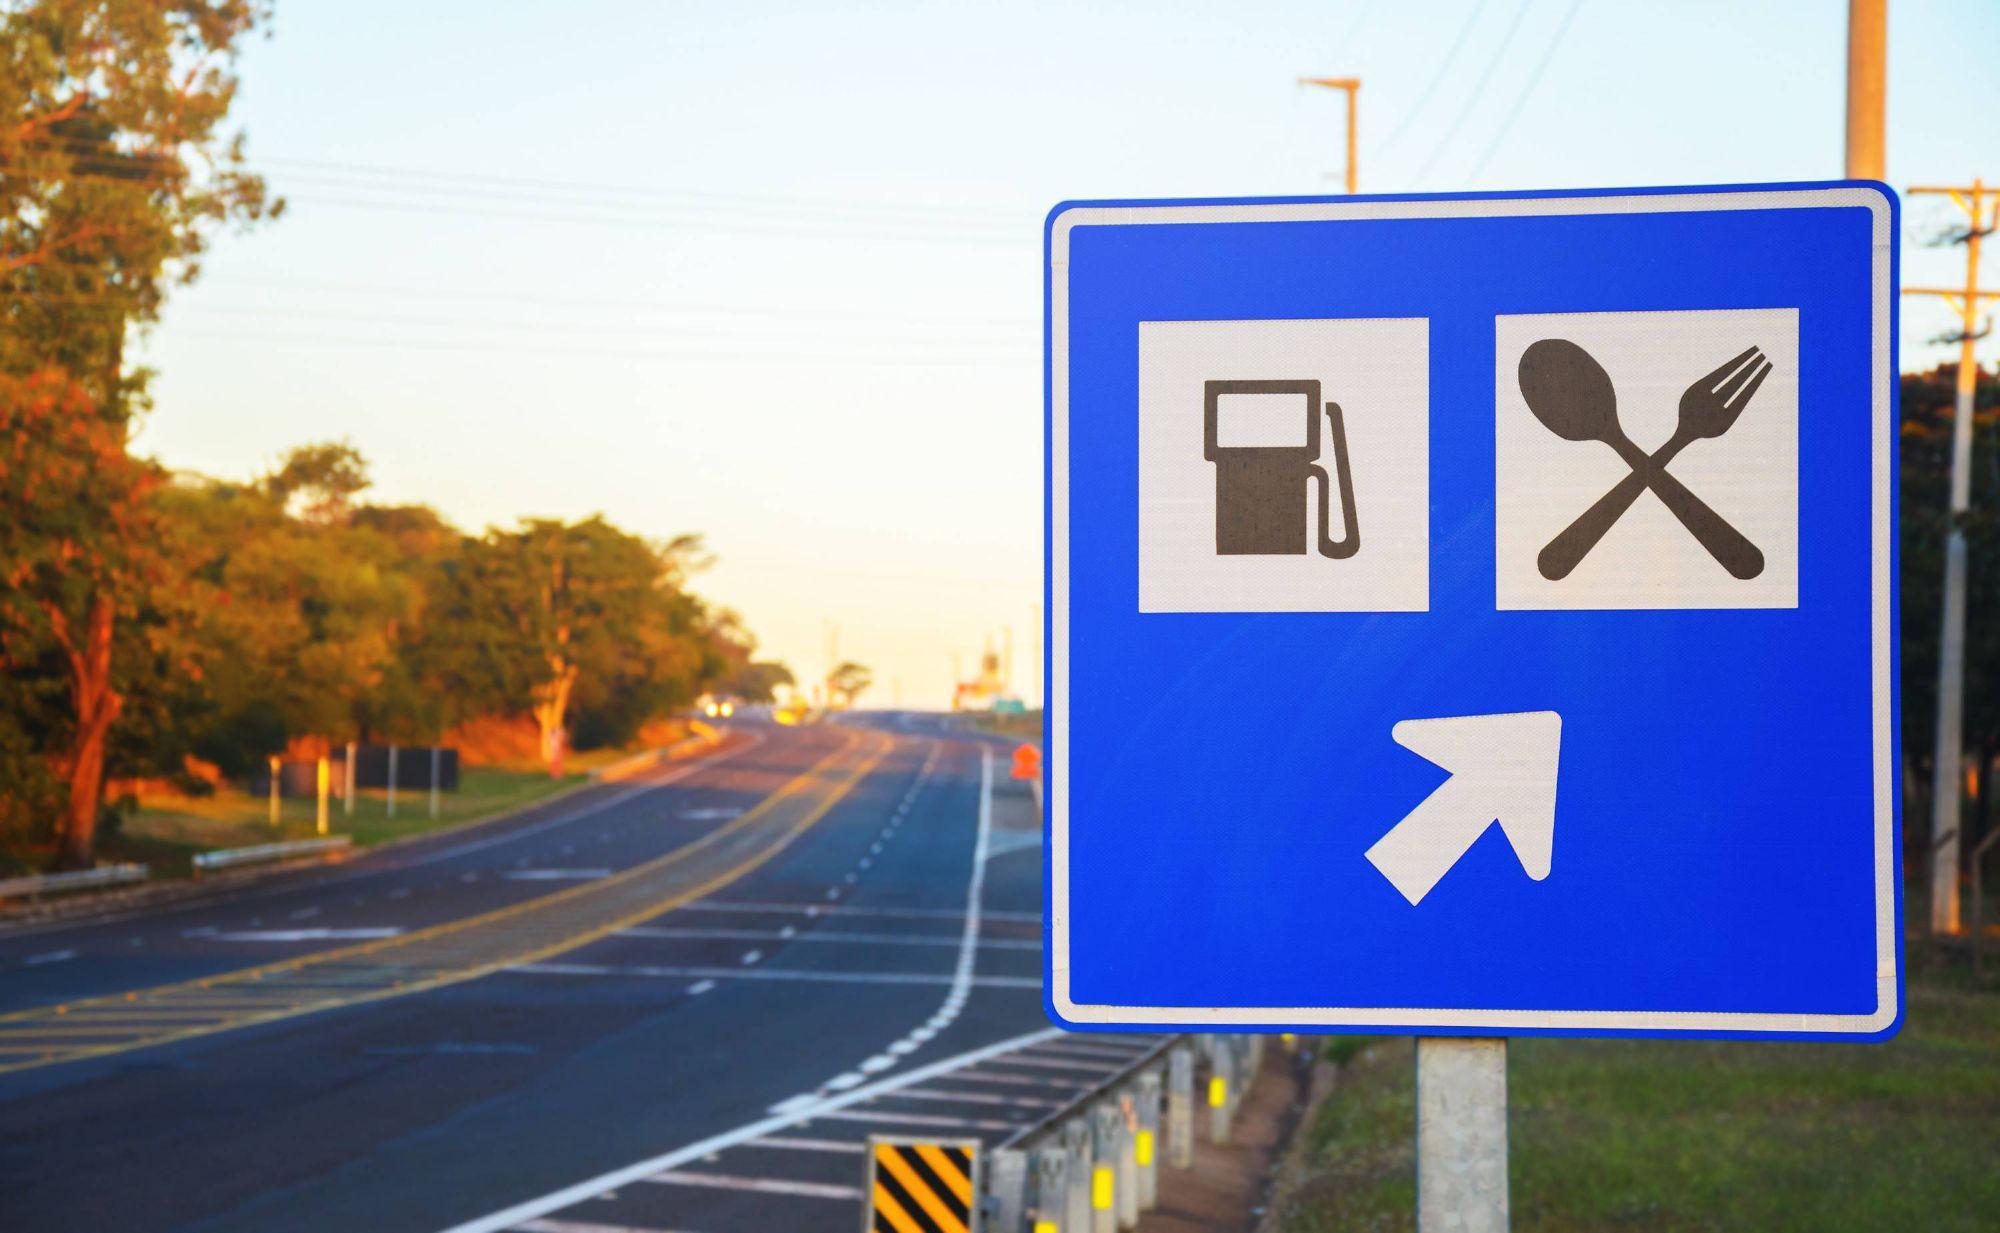 Lebensmittelsicherheit in Tankstellen - Webinar